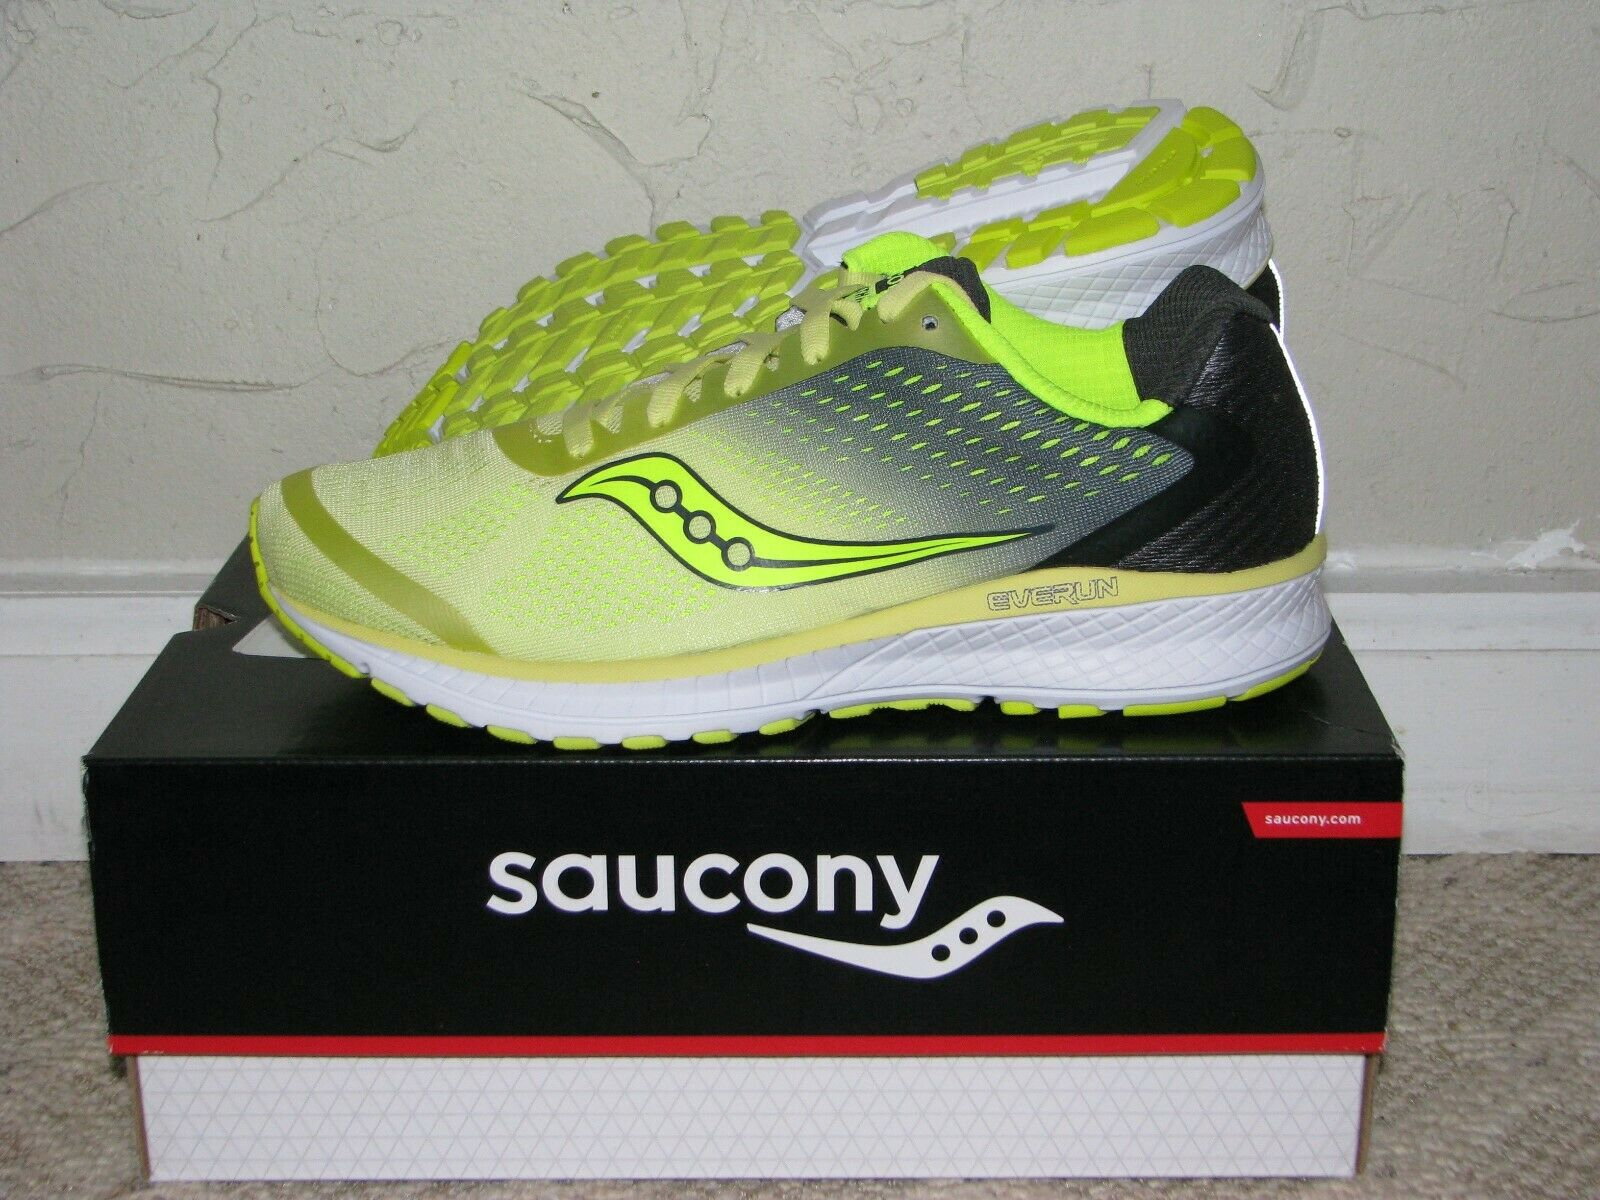 Saucony Breakthru 4 vert citron gris Femme Taille 7.5 Neuf  S10419-3 Running Everun